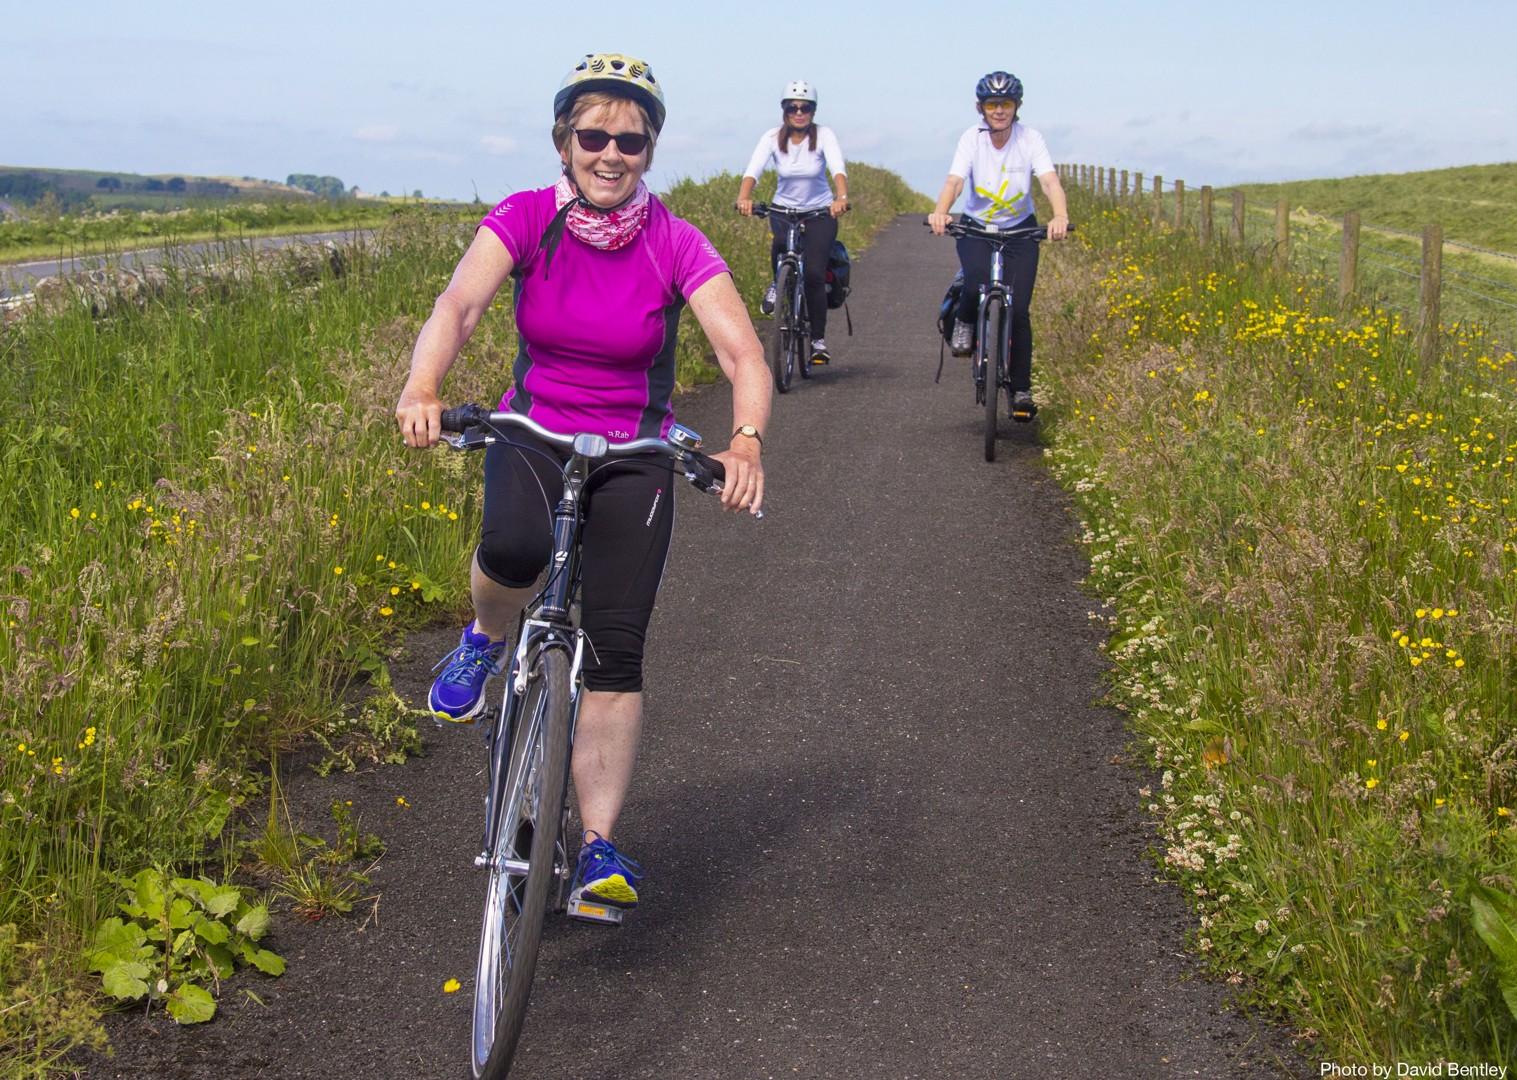 Self-Guided-Leisure-Cycling-Holiday-Hadrians-Cycleway-UK-forts-of-Birdoswald-Vindolanda.jpg - UK - Hadrian's Cycleway - 4 Days Cycling - Self-Guided Leisure Cycling Holiday - Leisure Cycling